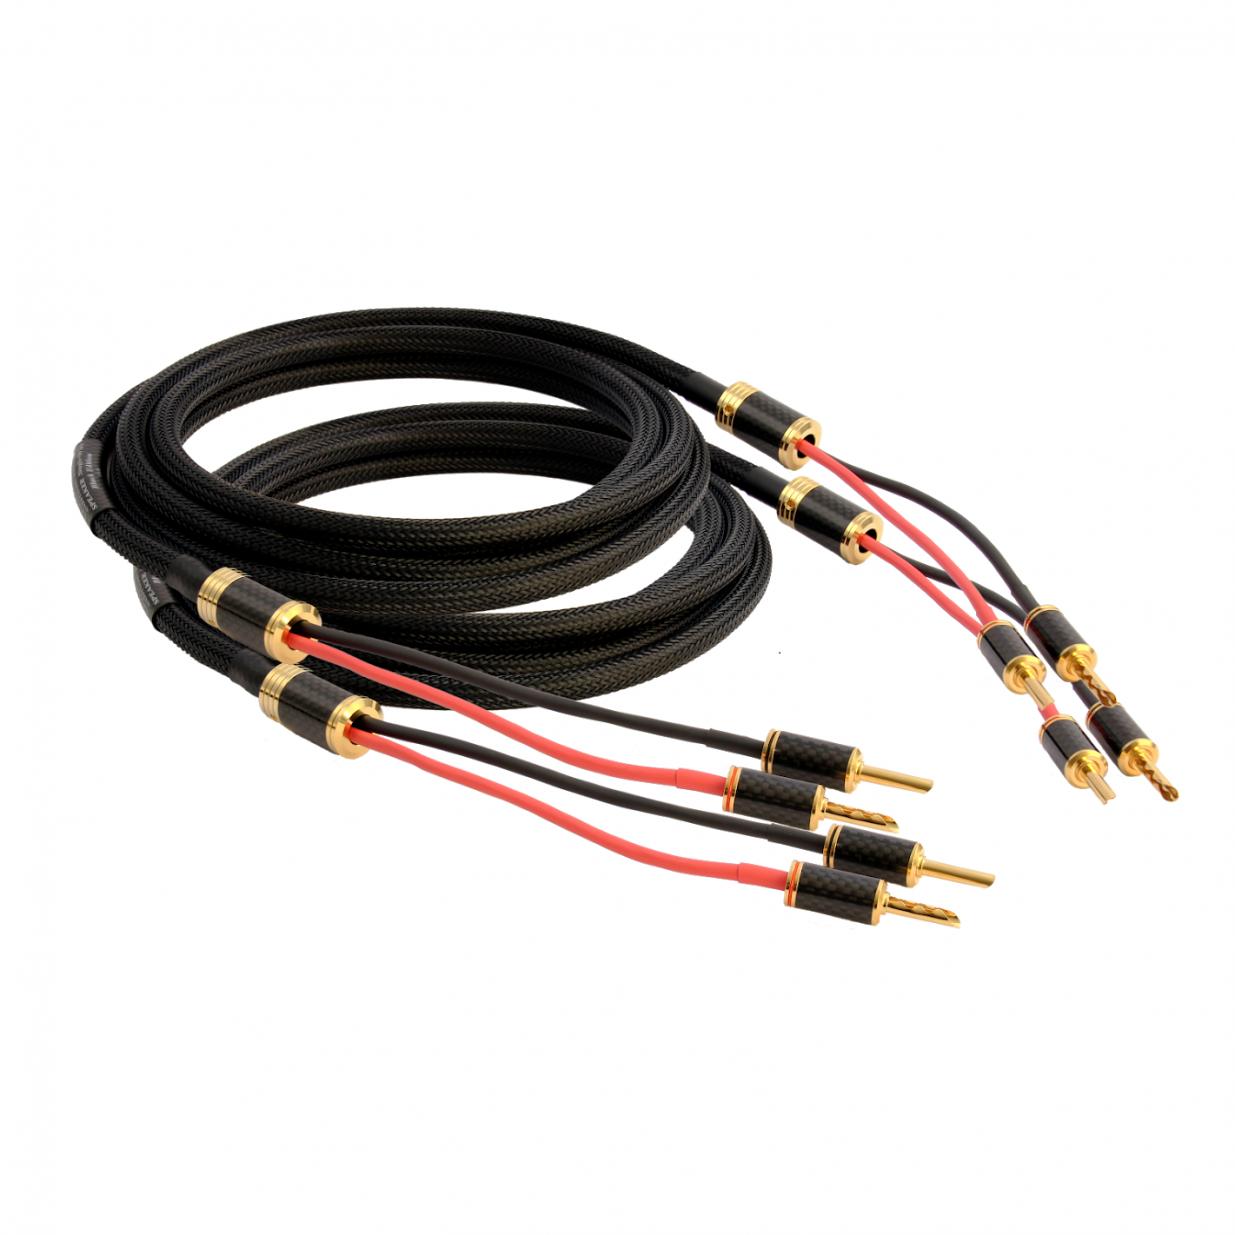 Кабель акустический Goldkabel Black Edition SC Single-Wire 4m